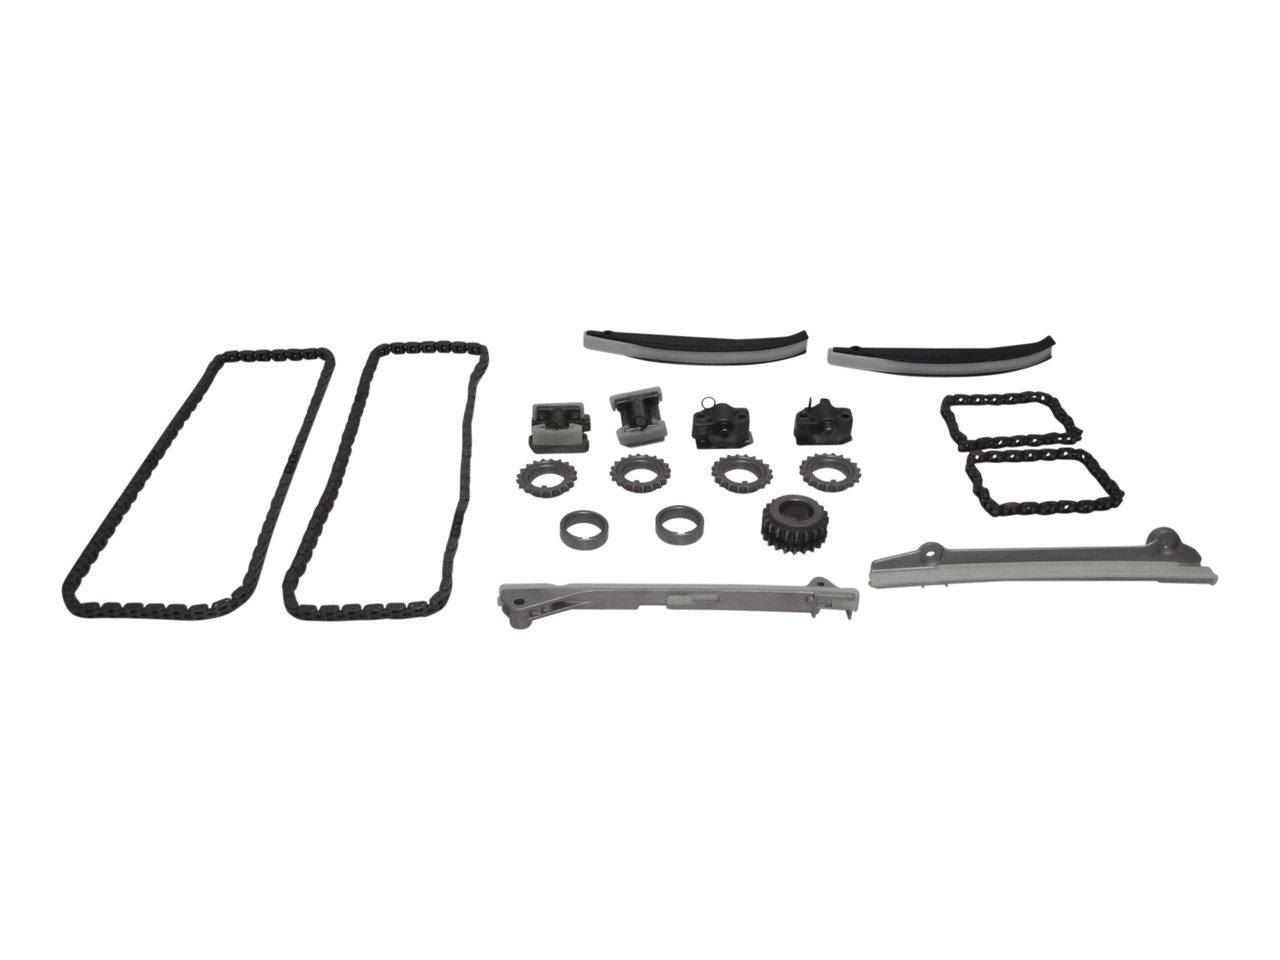 Timing Chain Kit Ford Falcon Xr8 54l V8 Boss Ba Bf Fg Tru Flow Tensioner Gear For Mitsubishi Pajero Pickup Triton Suitable